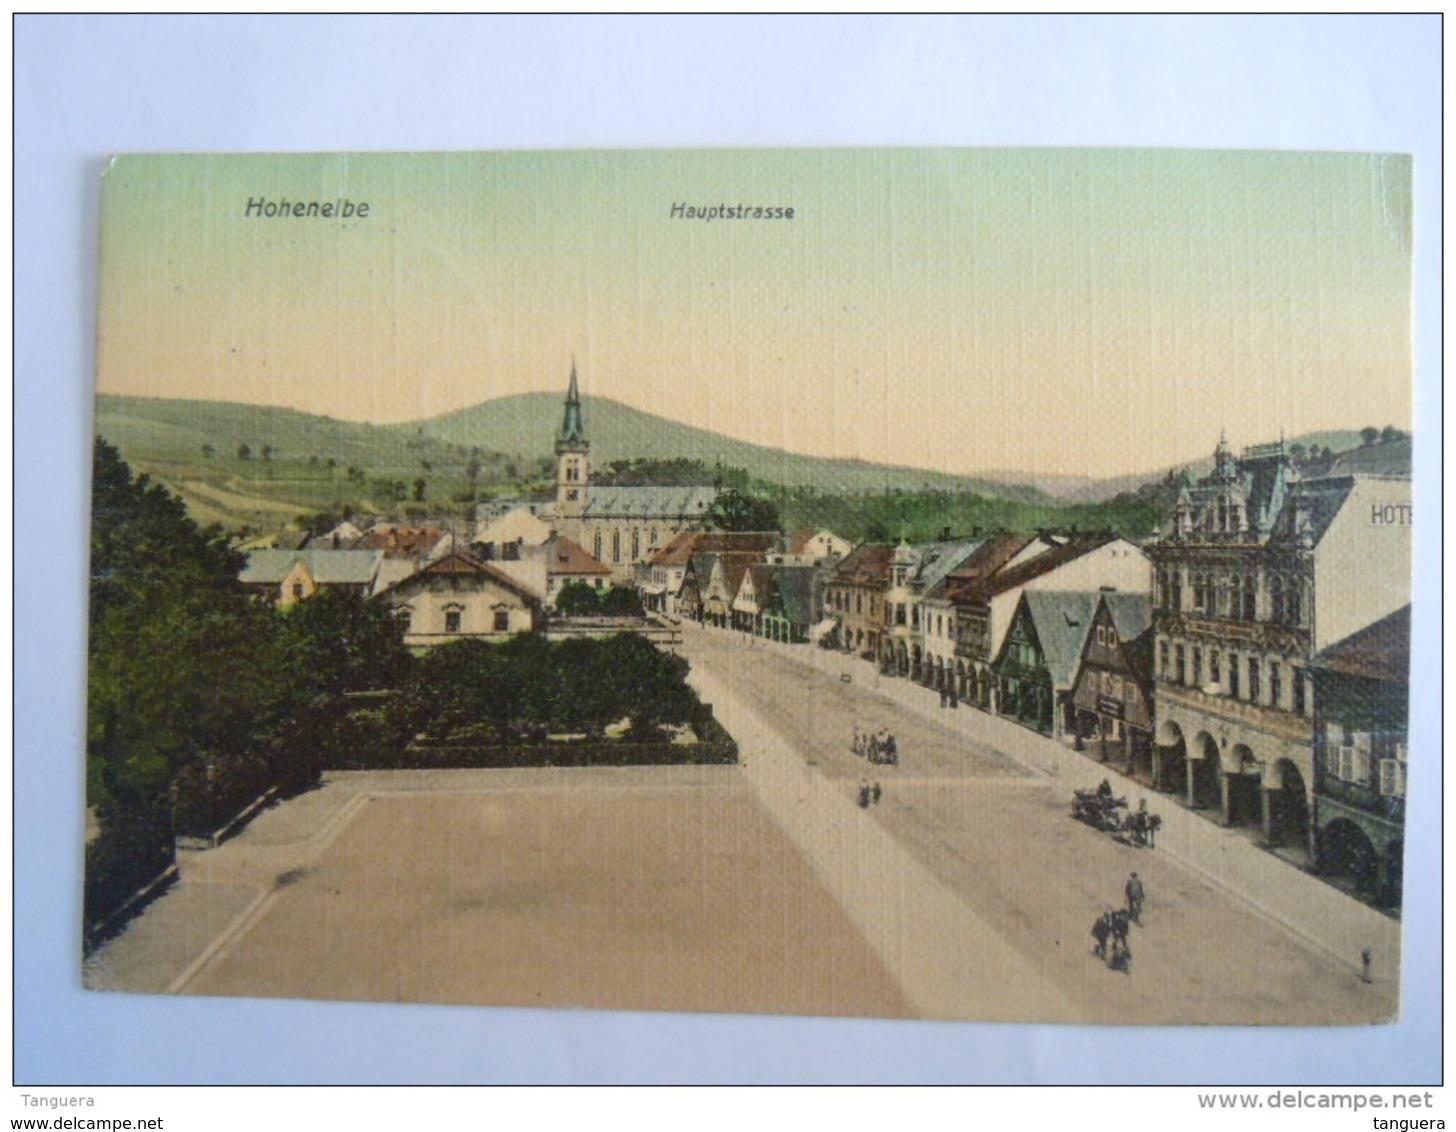 Cpa Vrchlabi Hohenelbe Hauptstrasse Circulée Used 1909 - Tschechische Republik